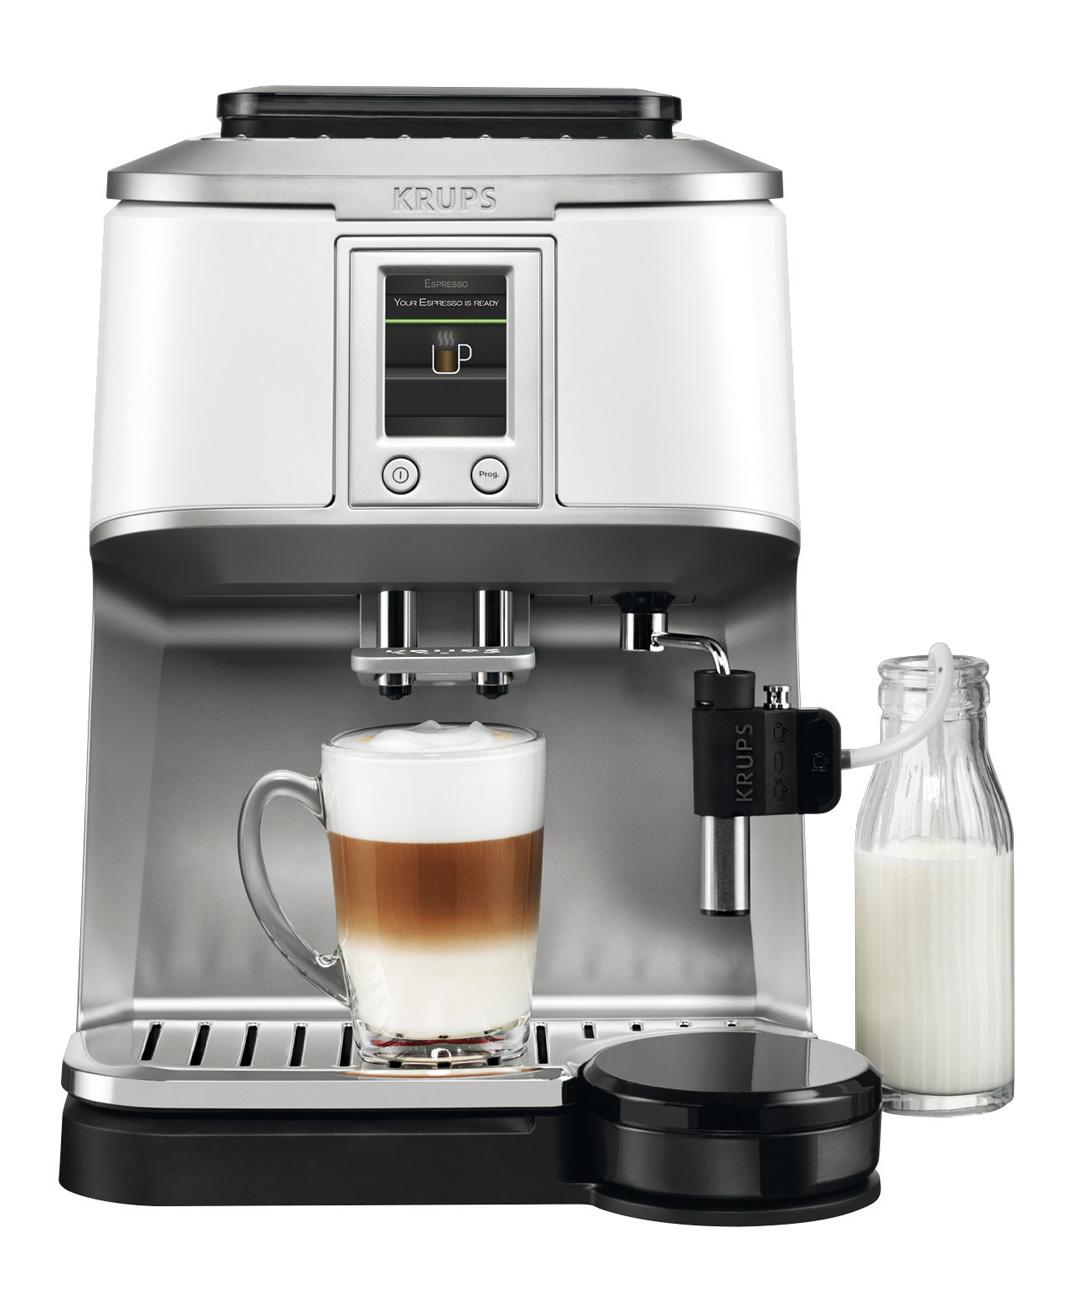 krups kaffeevollautomat latte tray f r klassischen kaffee. Black Bedroom Furniture Sets. Home Design Ideas